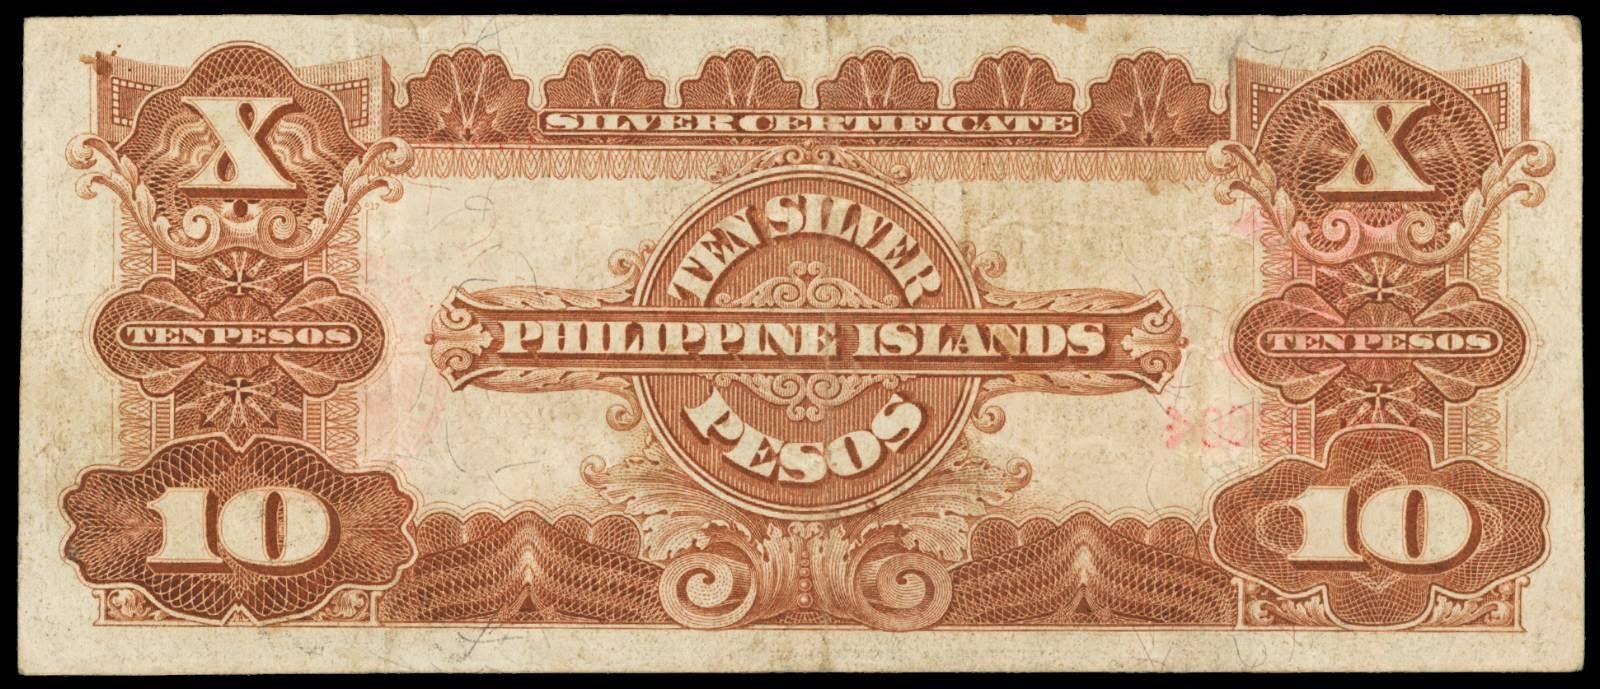 1912 Philippine Islands Ten Silver Pesos Certificate